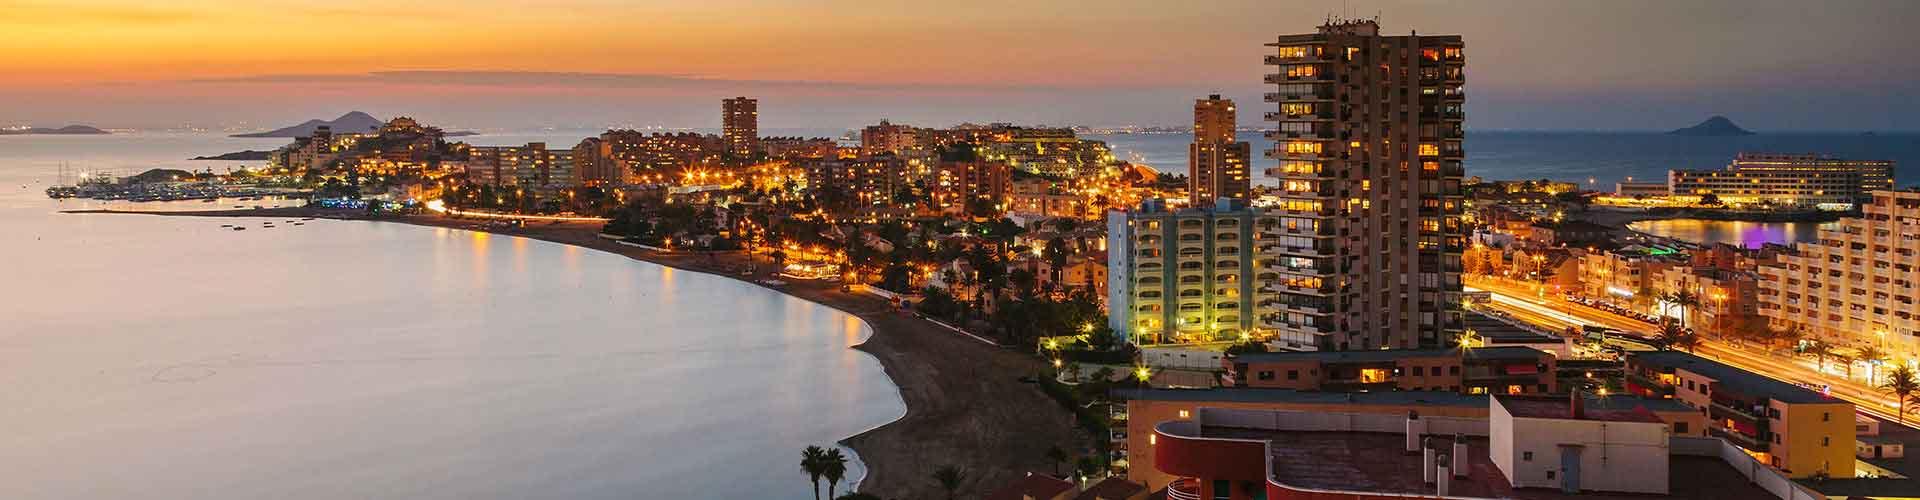 Murcia - Apartamentos en Murcia. Mapas de Murcia, Fotos y comentarios de cada Apartamento en Murcia.